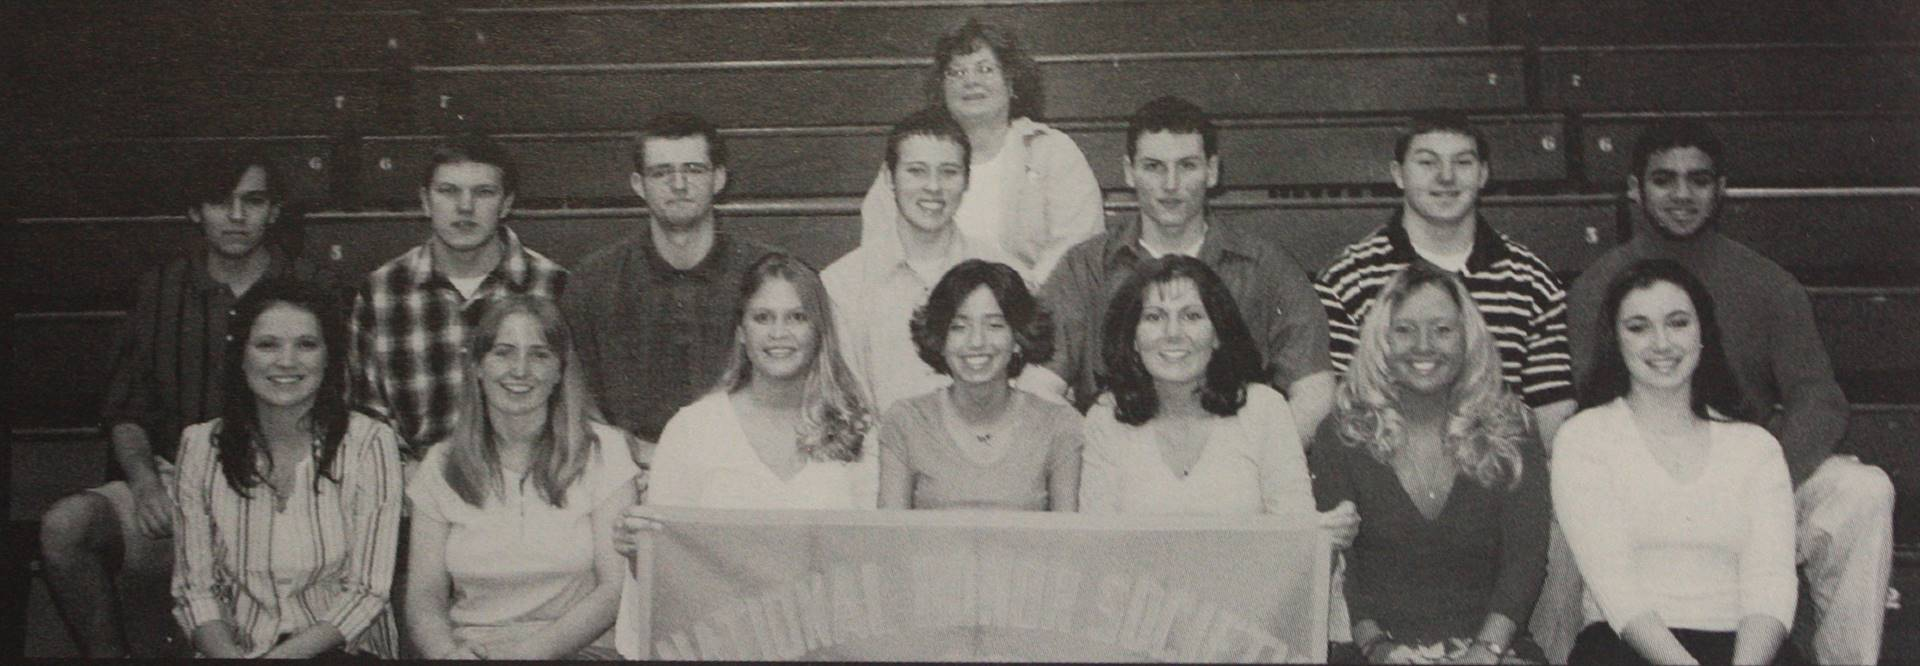 2002 NHS